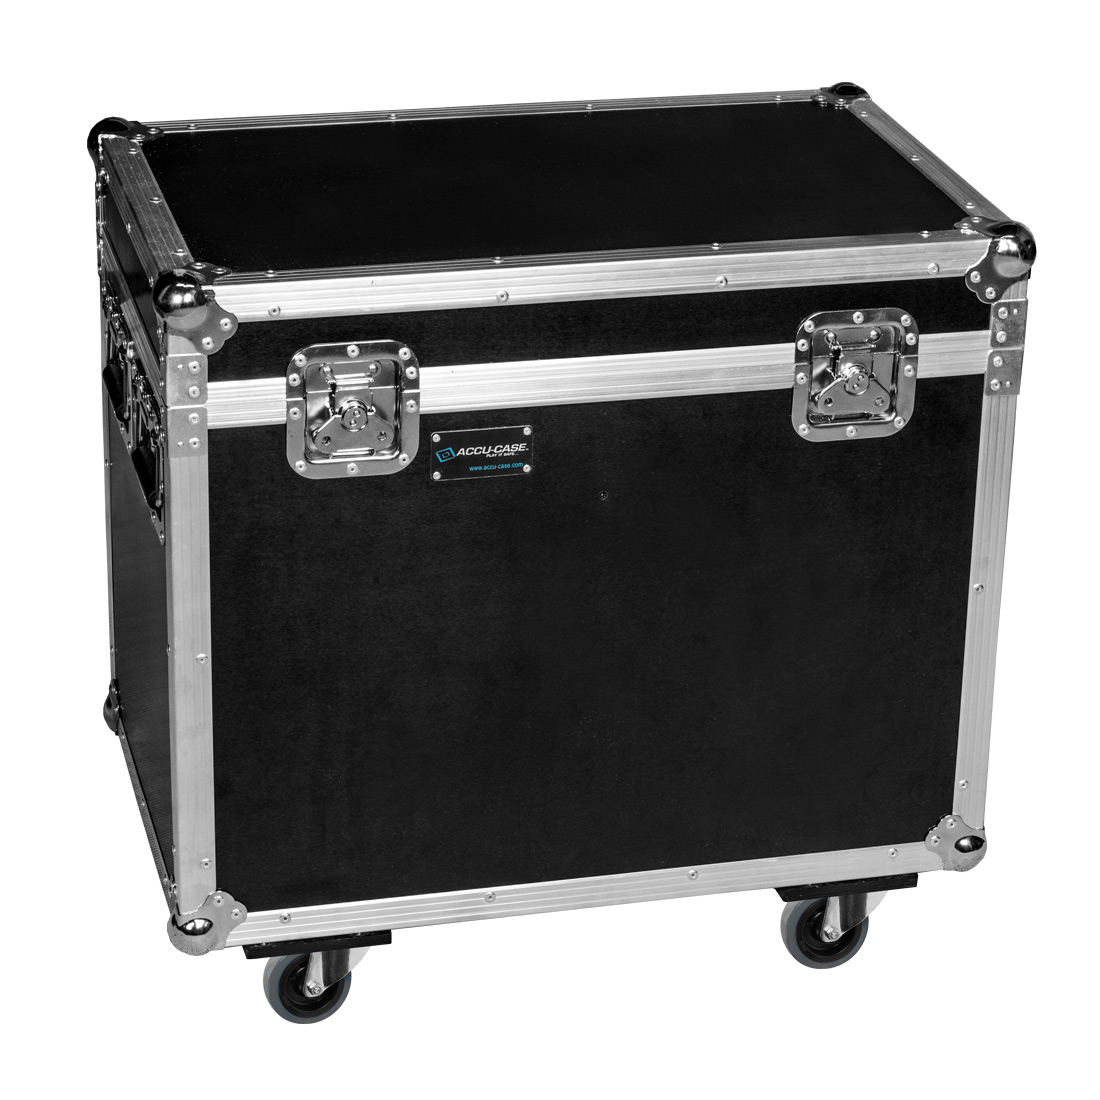 ADJ Touring Case 2x Inno Spot Elite